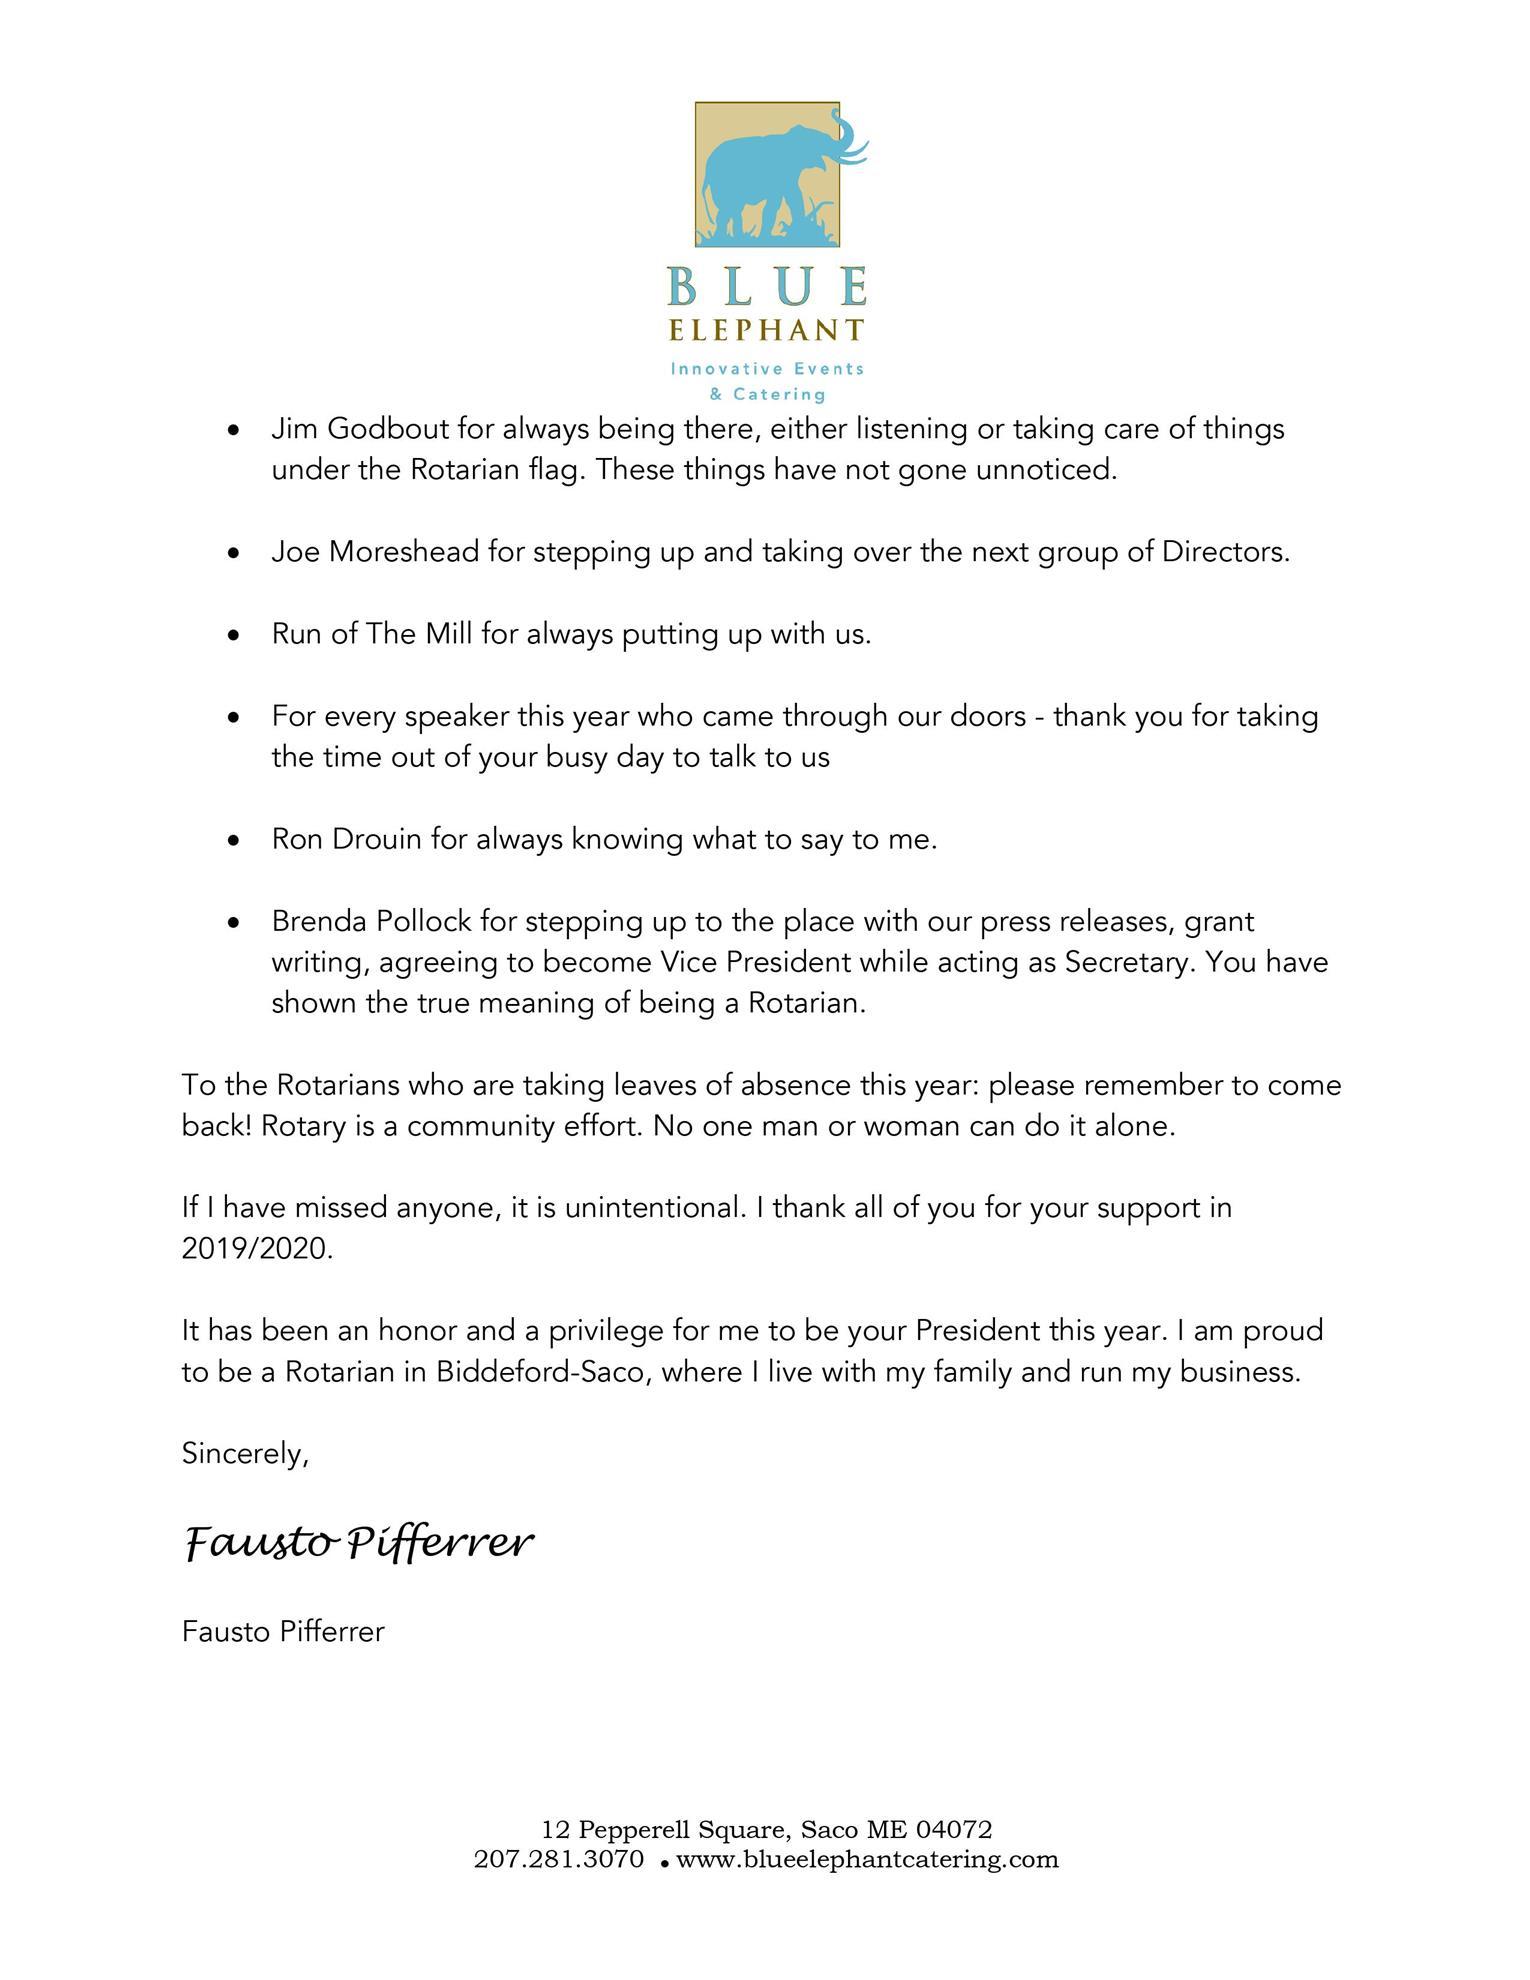 Stories Rotary Club Of Biddeford Saco